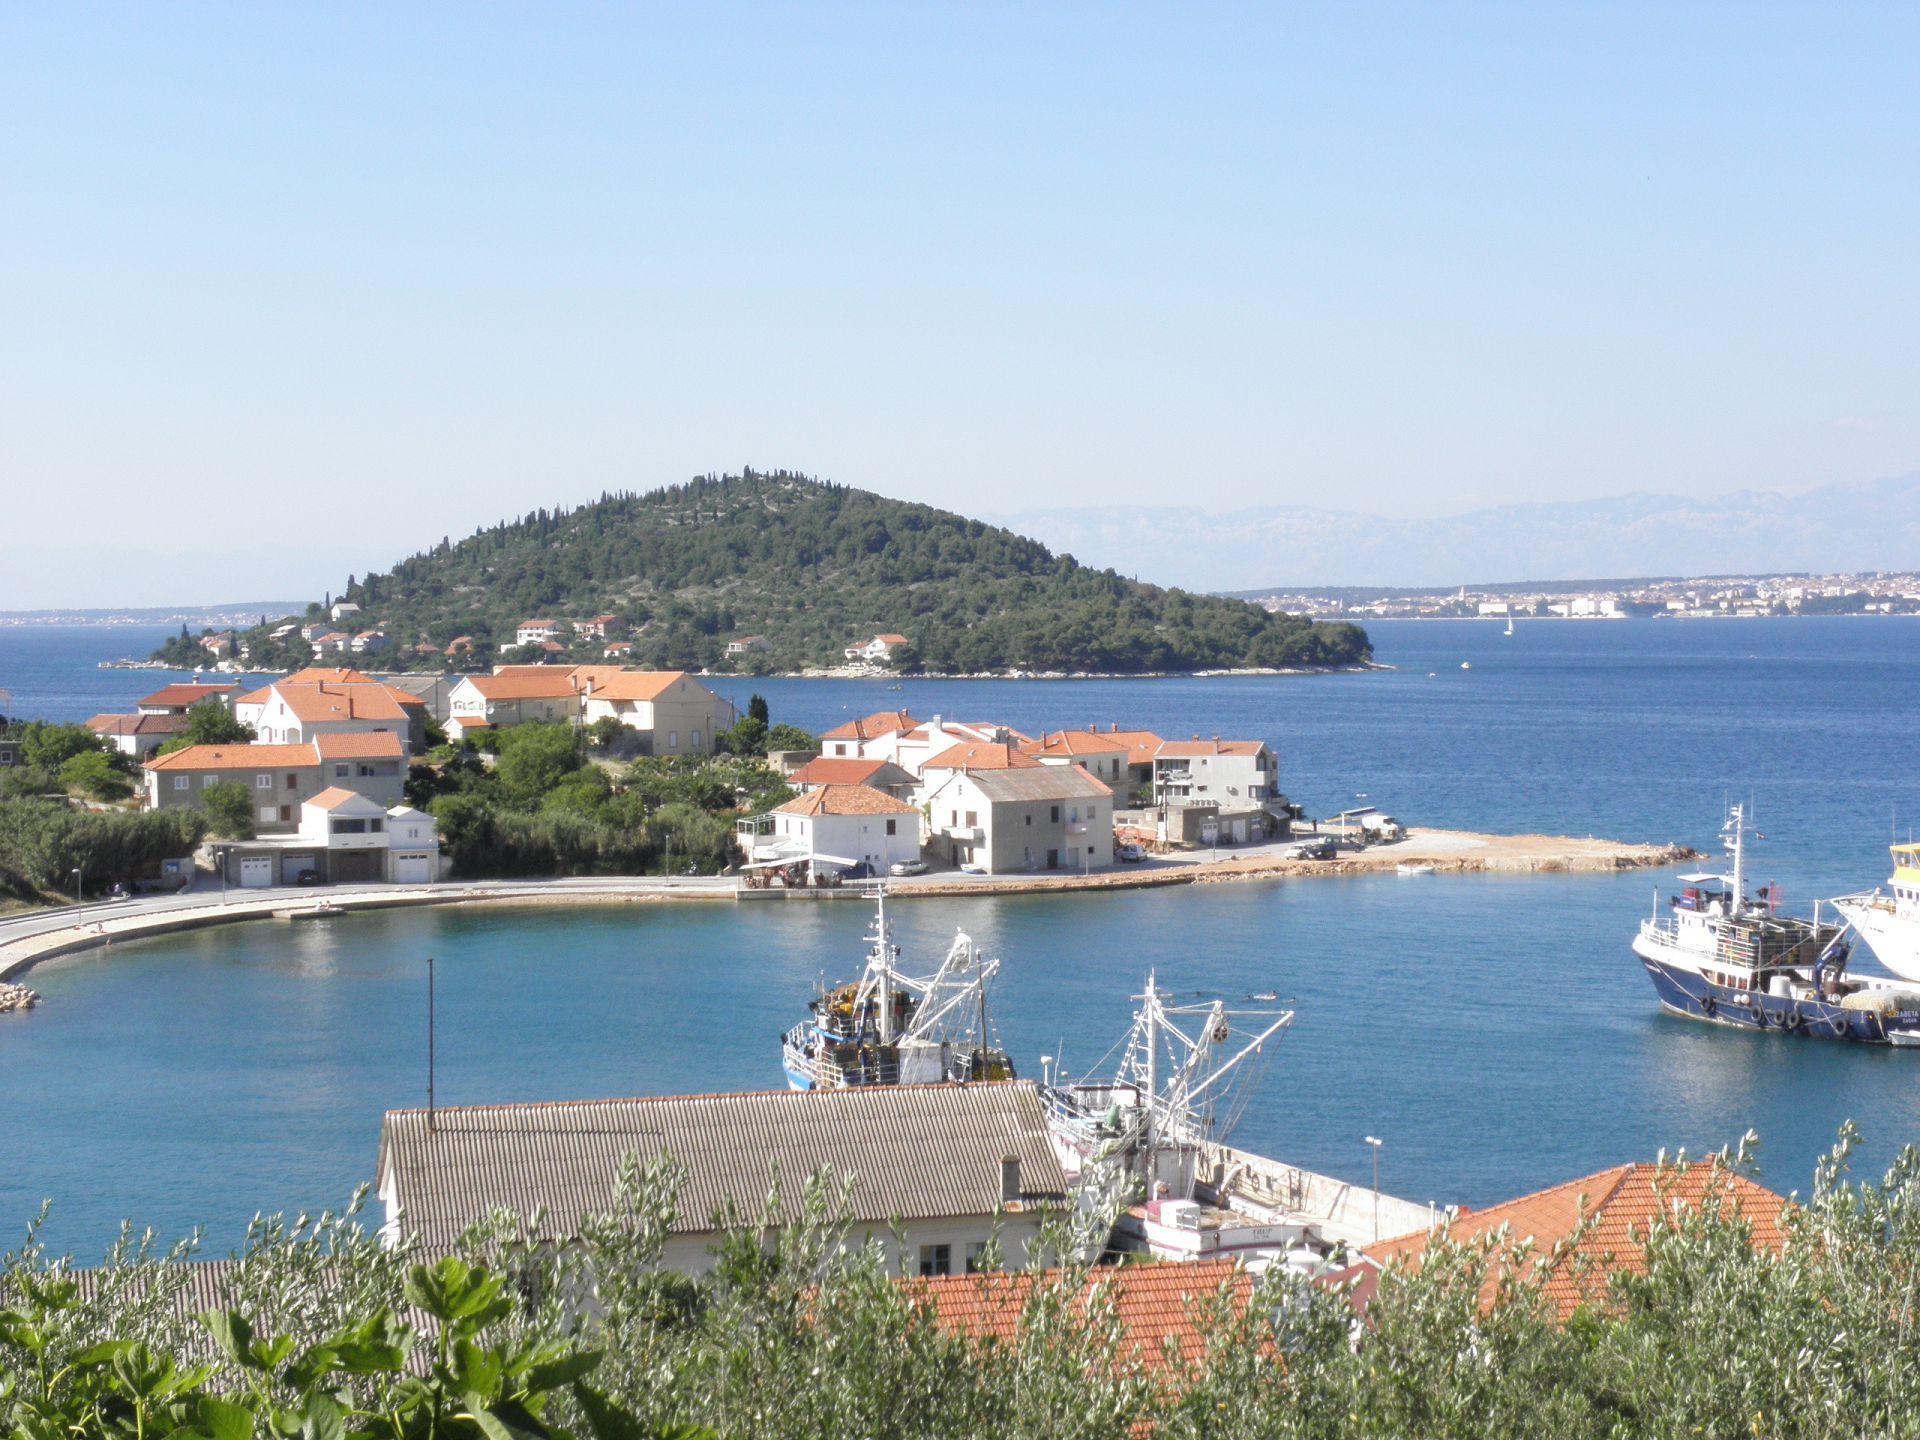 Ferienwohnung Novis A1 Ana (2+1) - Kali (743268), Kali, Insel Ugljan, Dalmatien, Kroatien, Bild 13